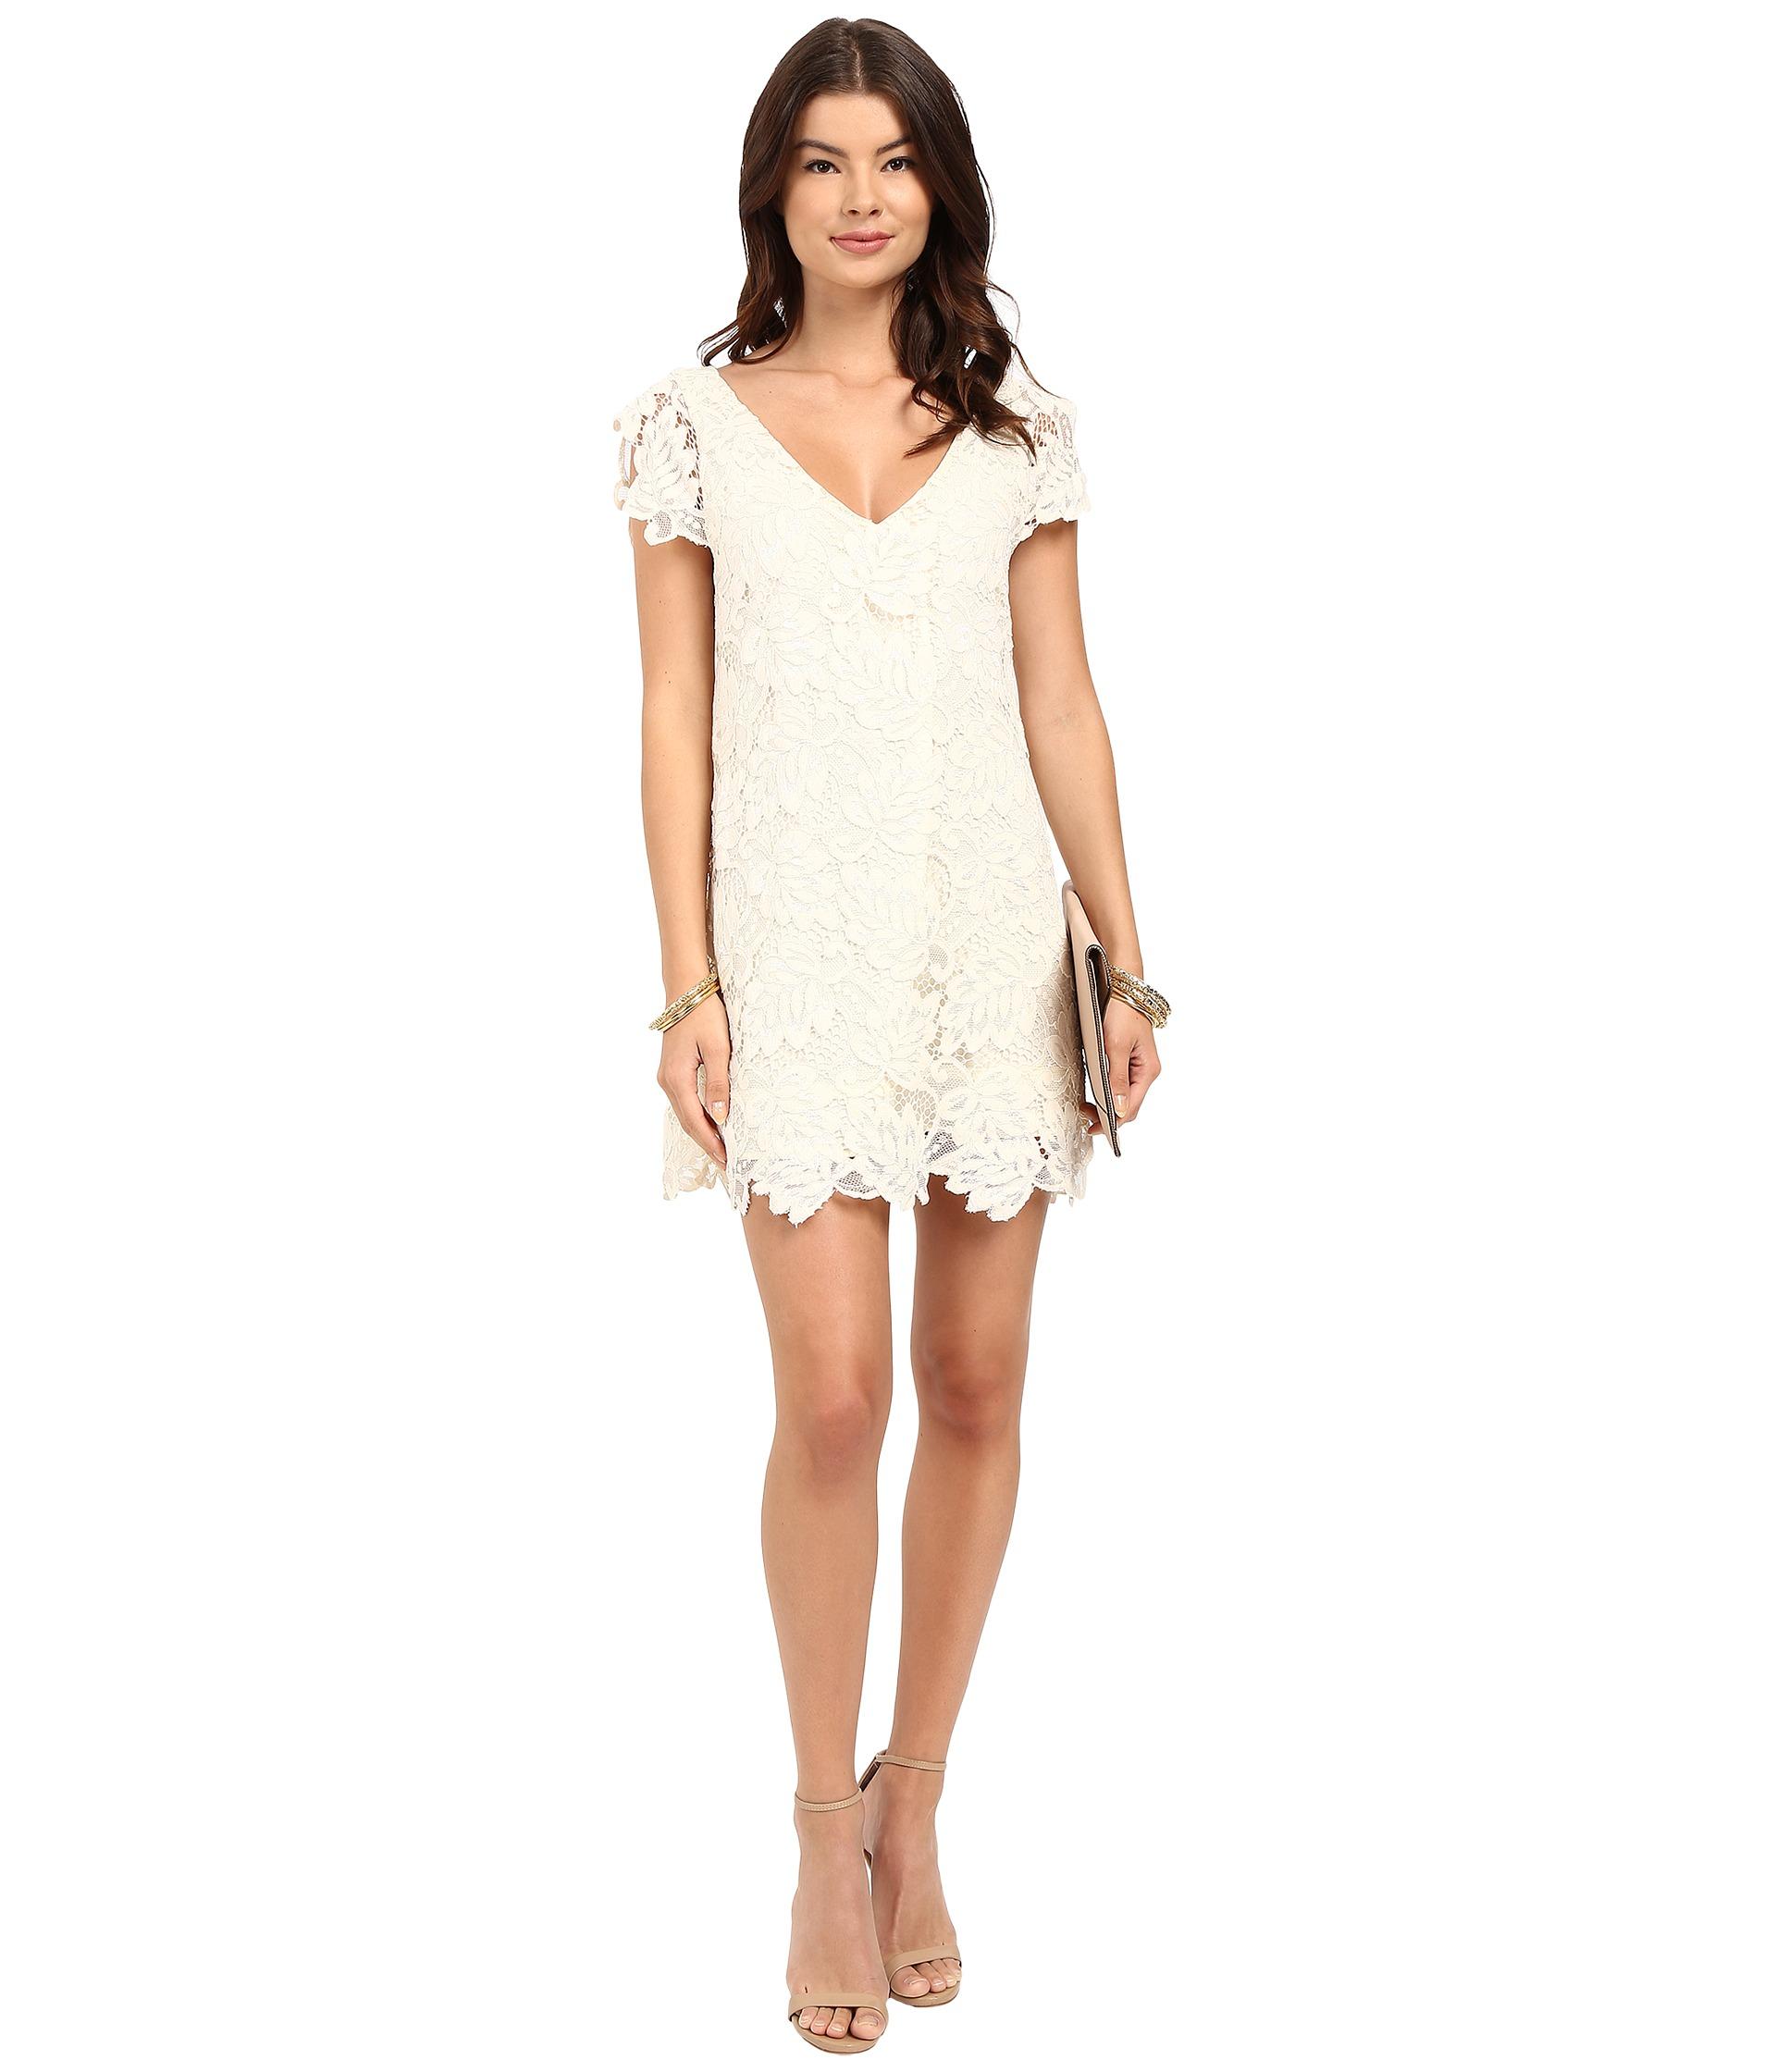 Jacqueline Scallop Lace V Neck Dress